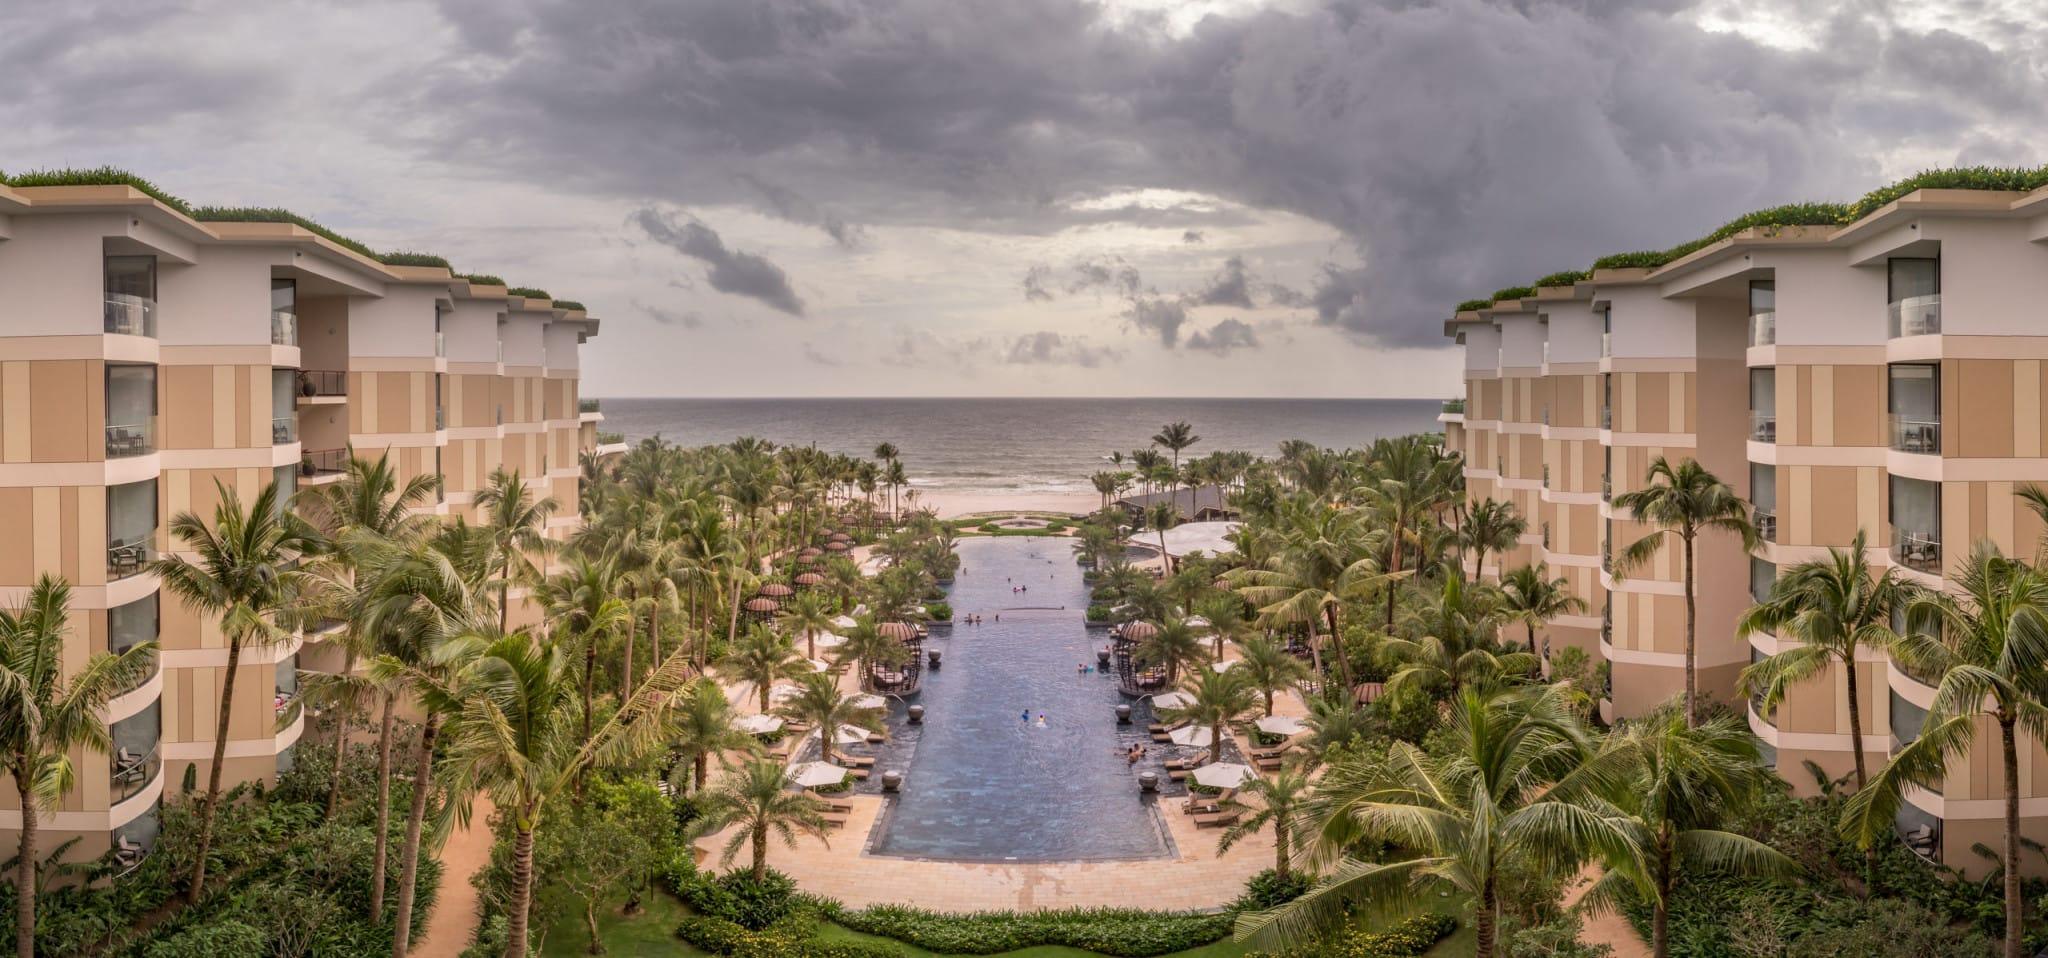 Panorama pool sea view - VIETNAM - Luxury stay: Intercontinental Phu Quoc Long Beach Resort review